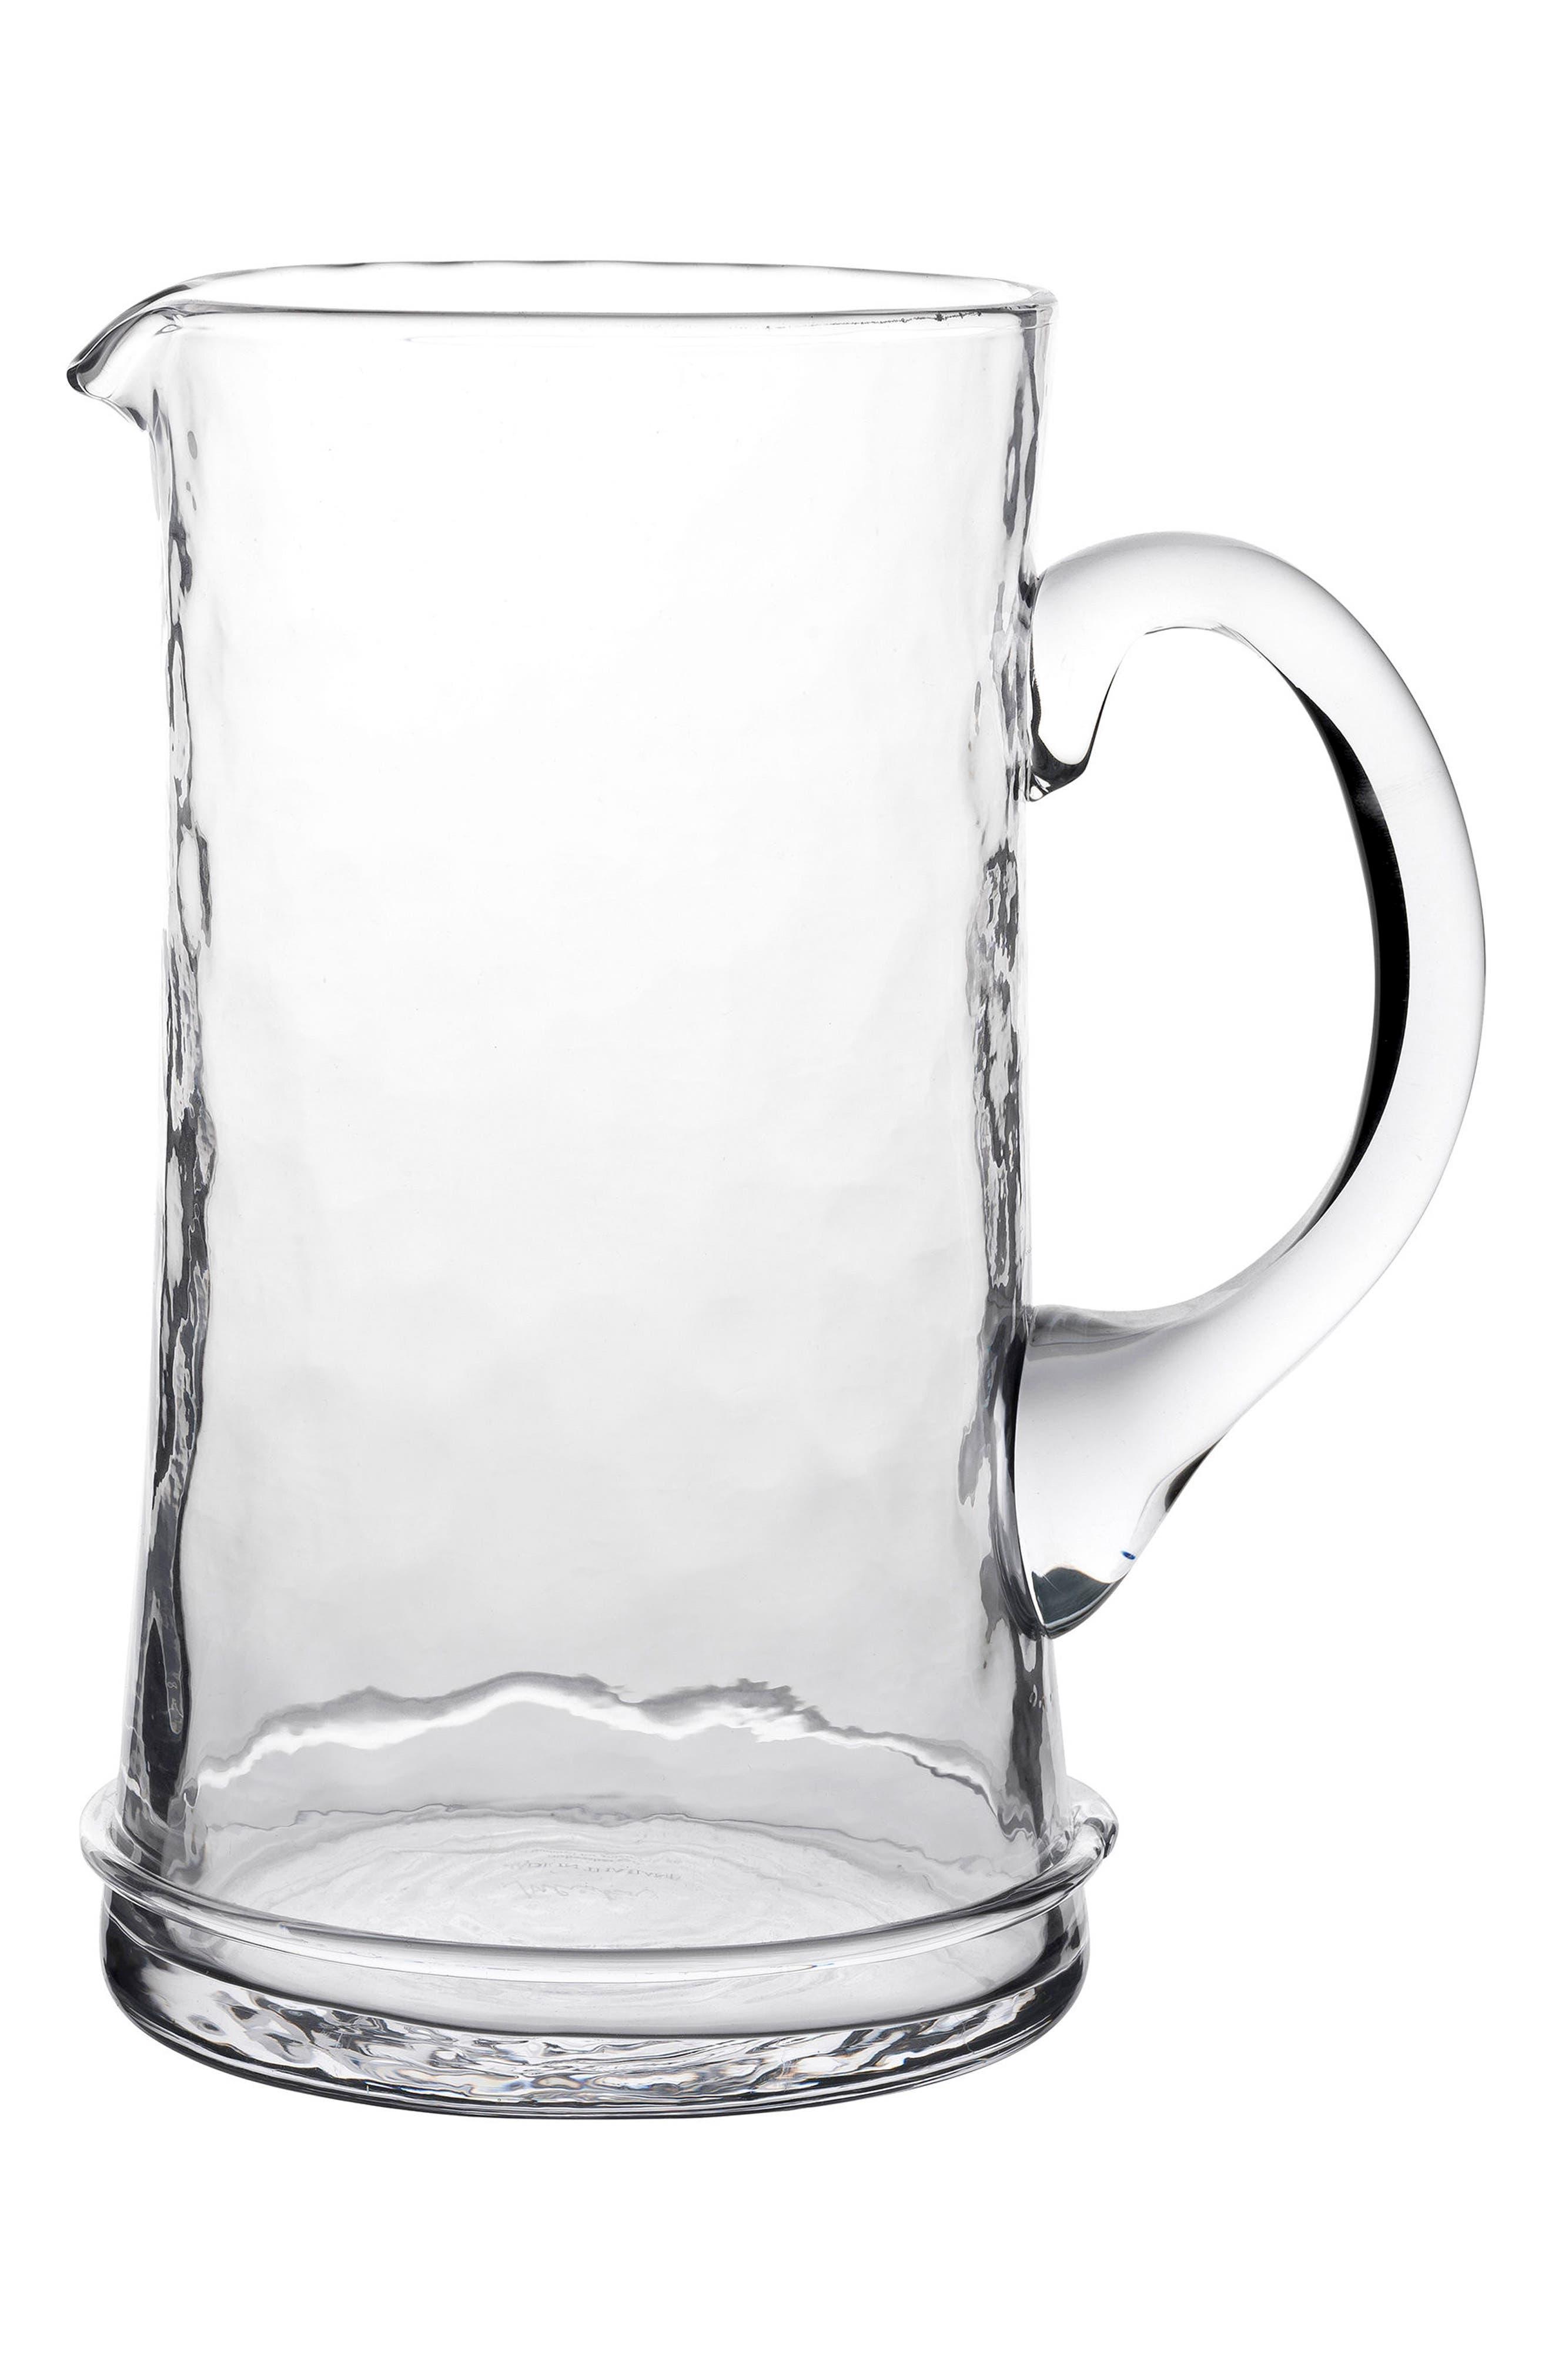 'Carine' Glass Pitcher,                             Alternate thumbnail 2, color,                             WHITE